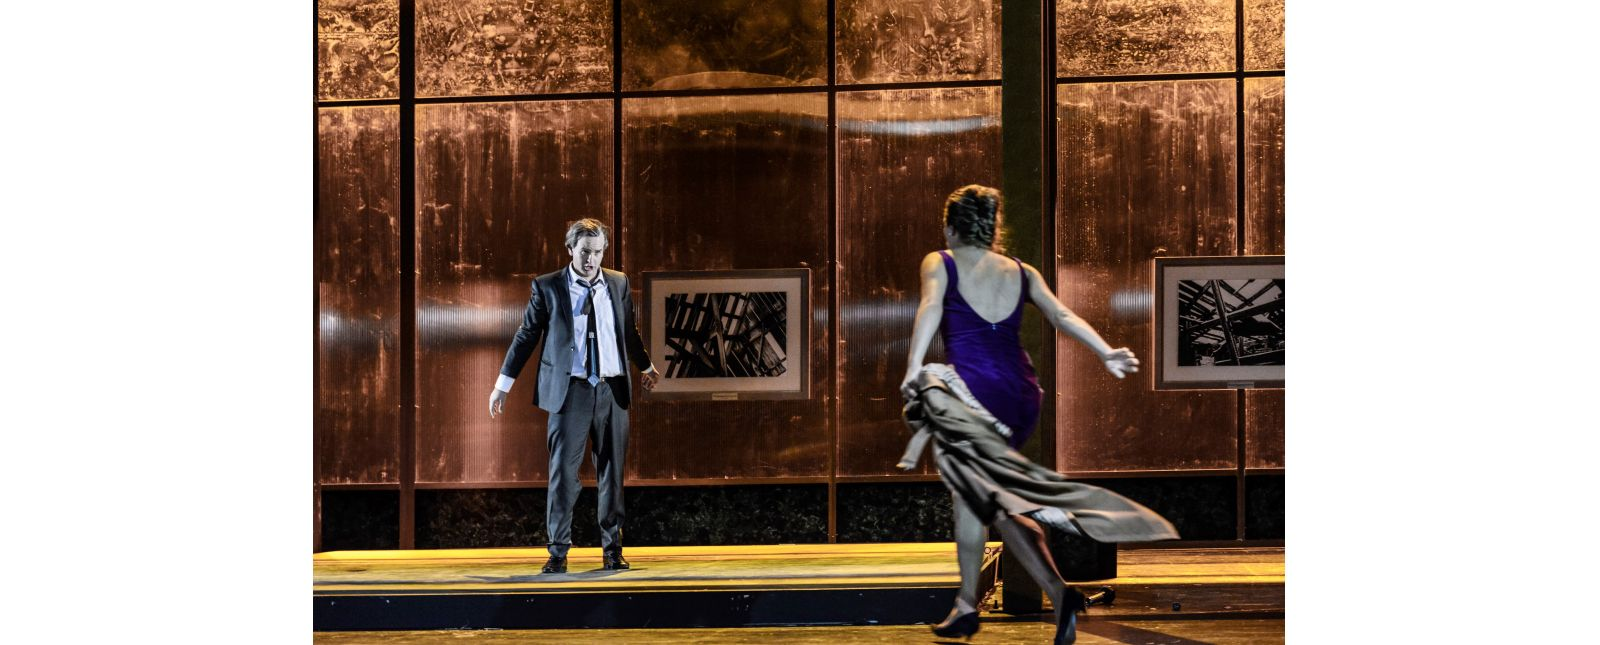 Eugen Onegin // Michael Borth // Solen Mainguené // 2018 // Tanja Dorendorf // T+T Fotografie